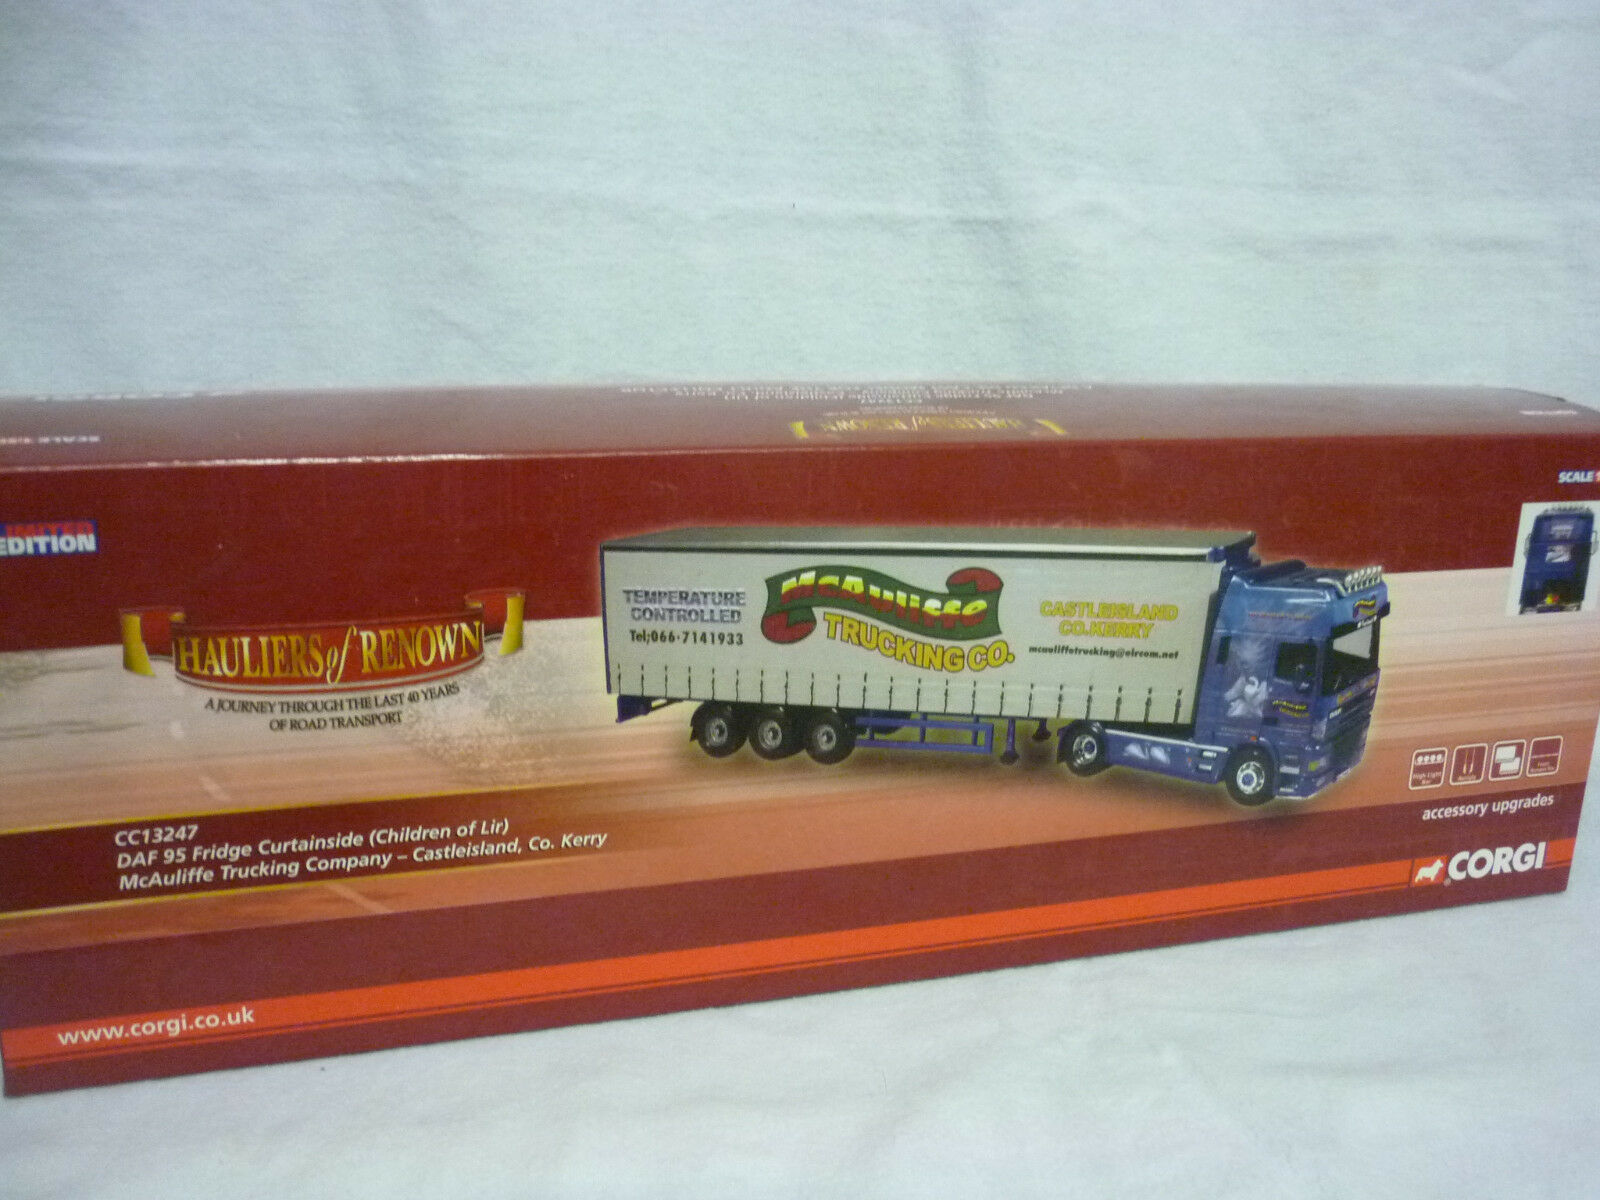 Corgi Modern Truck/transport CC13247 DAF Réfrigérateur Curt McAuliffe Trucking Trucking Trucking Comme neuf/boxed | Soldes  c3095a